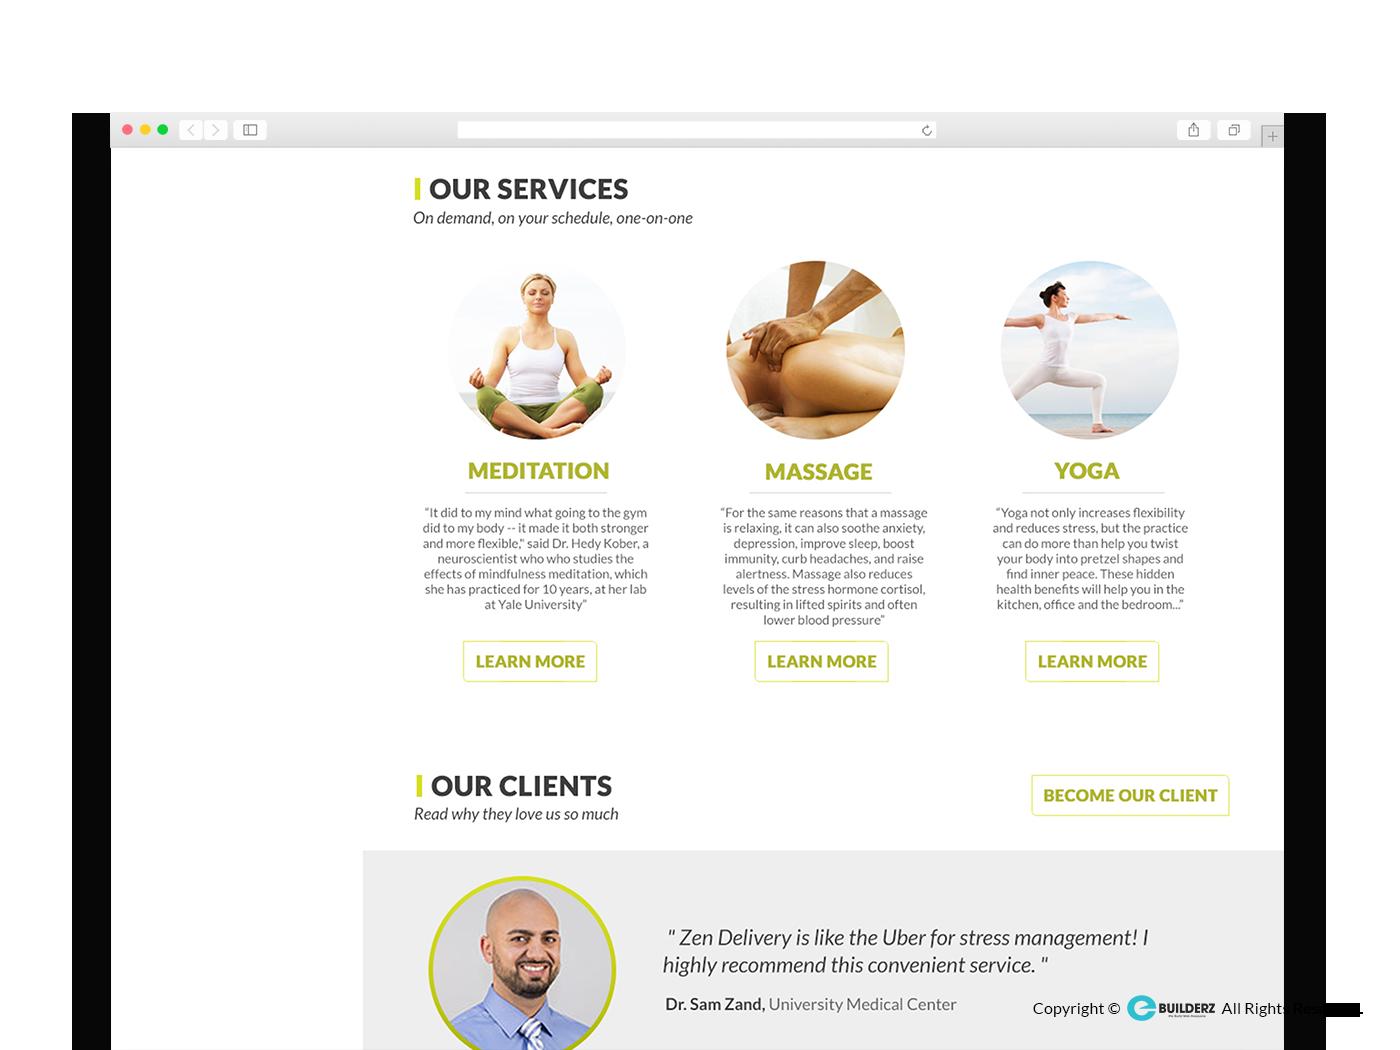 ZEN DELIVERY - WEBSITE DESIGN by RahulGiri 363793 - Freelancer on Guru